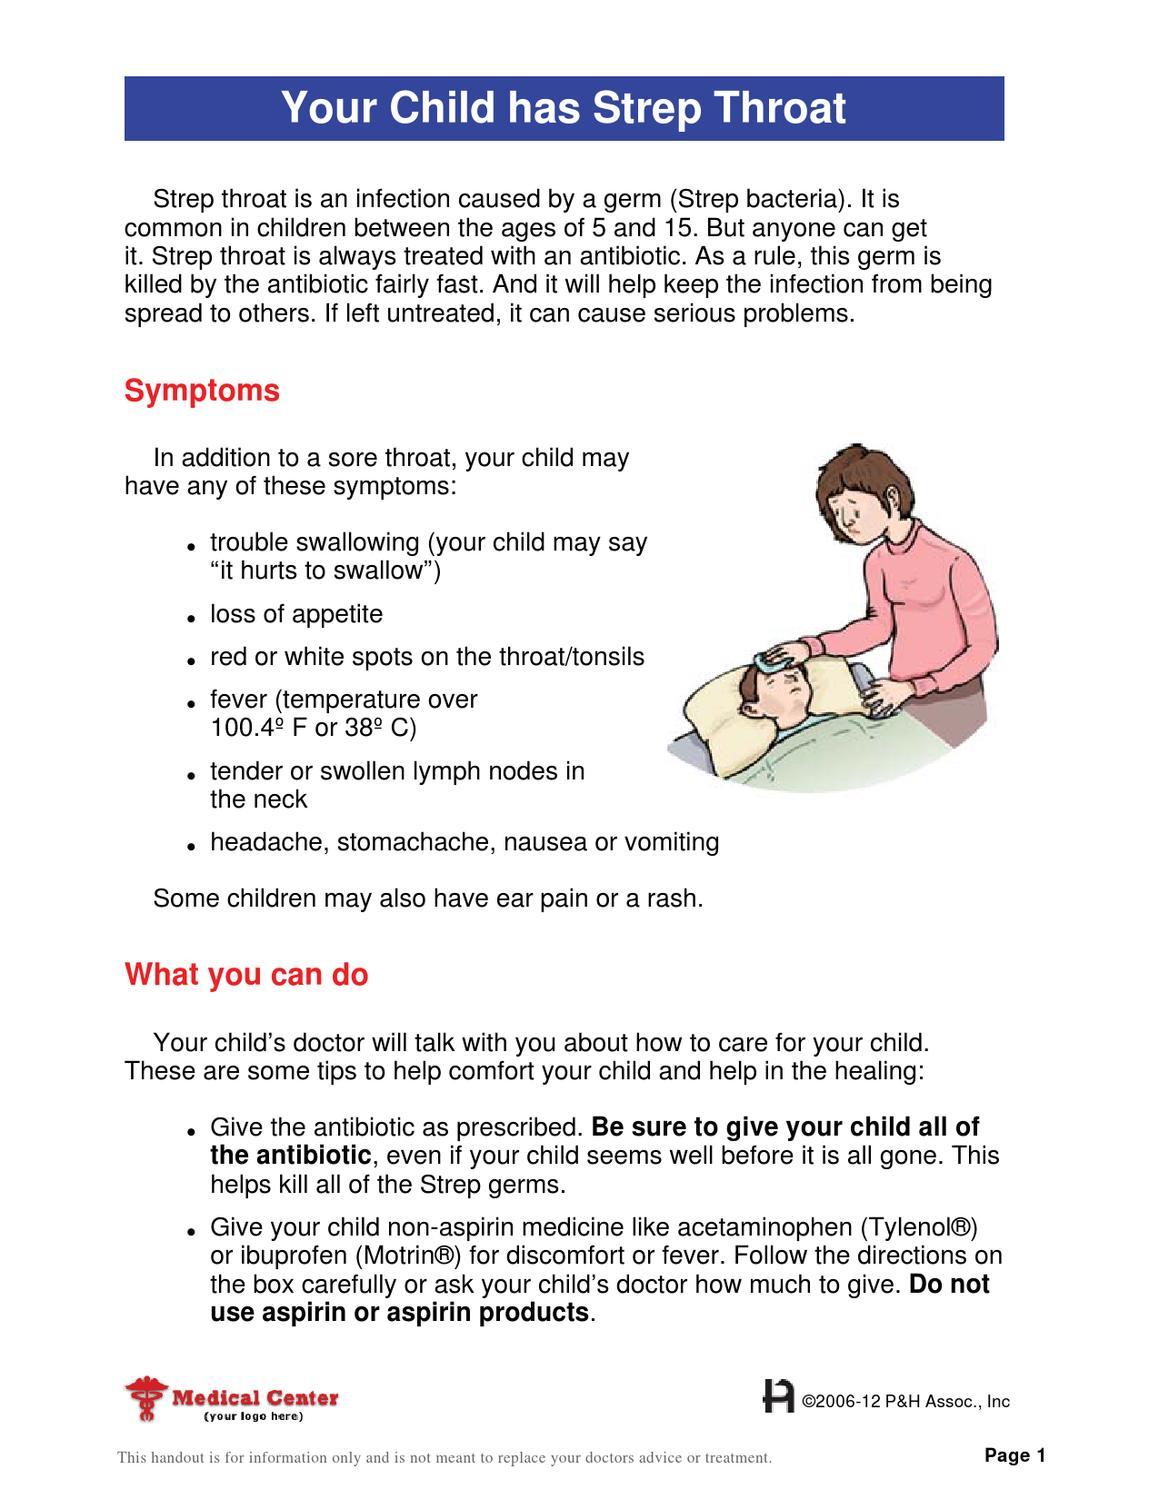 your child has strep throat by pritchett & hull associates, inc. - issuu